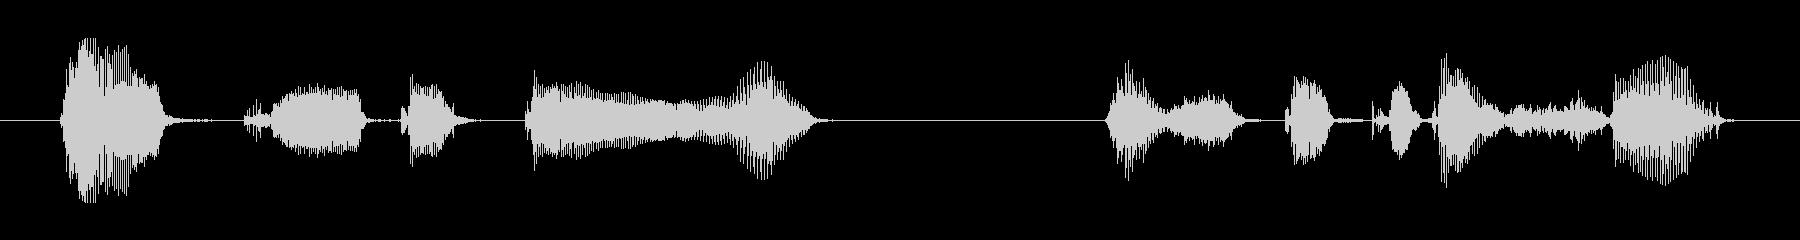 OKボタン(オッケーボタン)を、押して…の未再生の波形